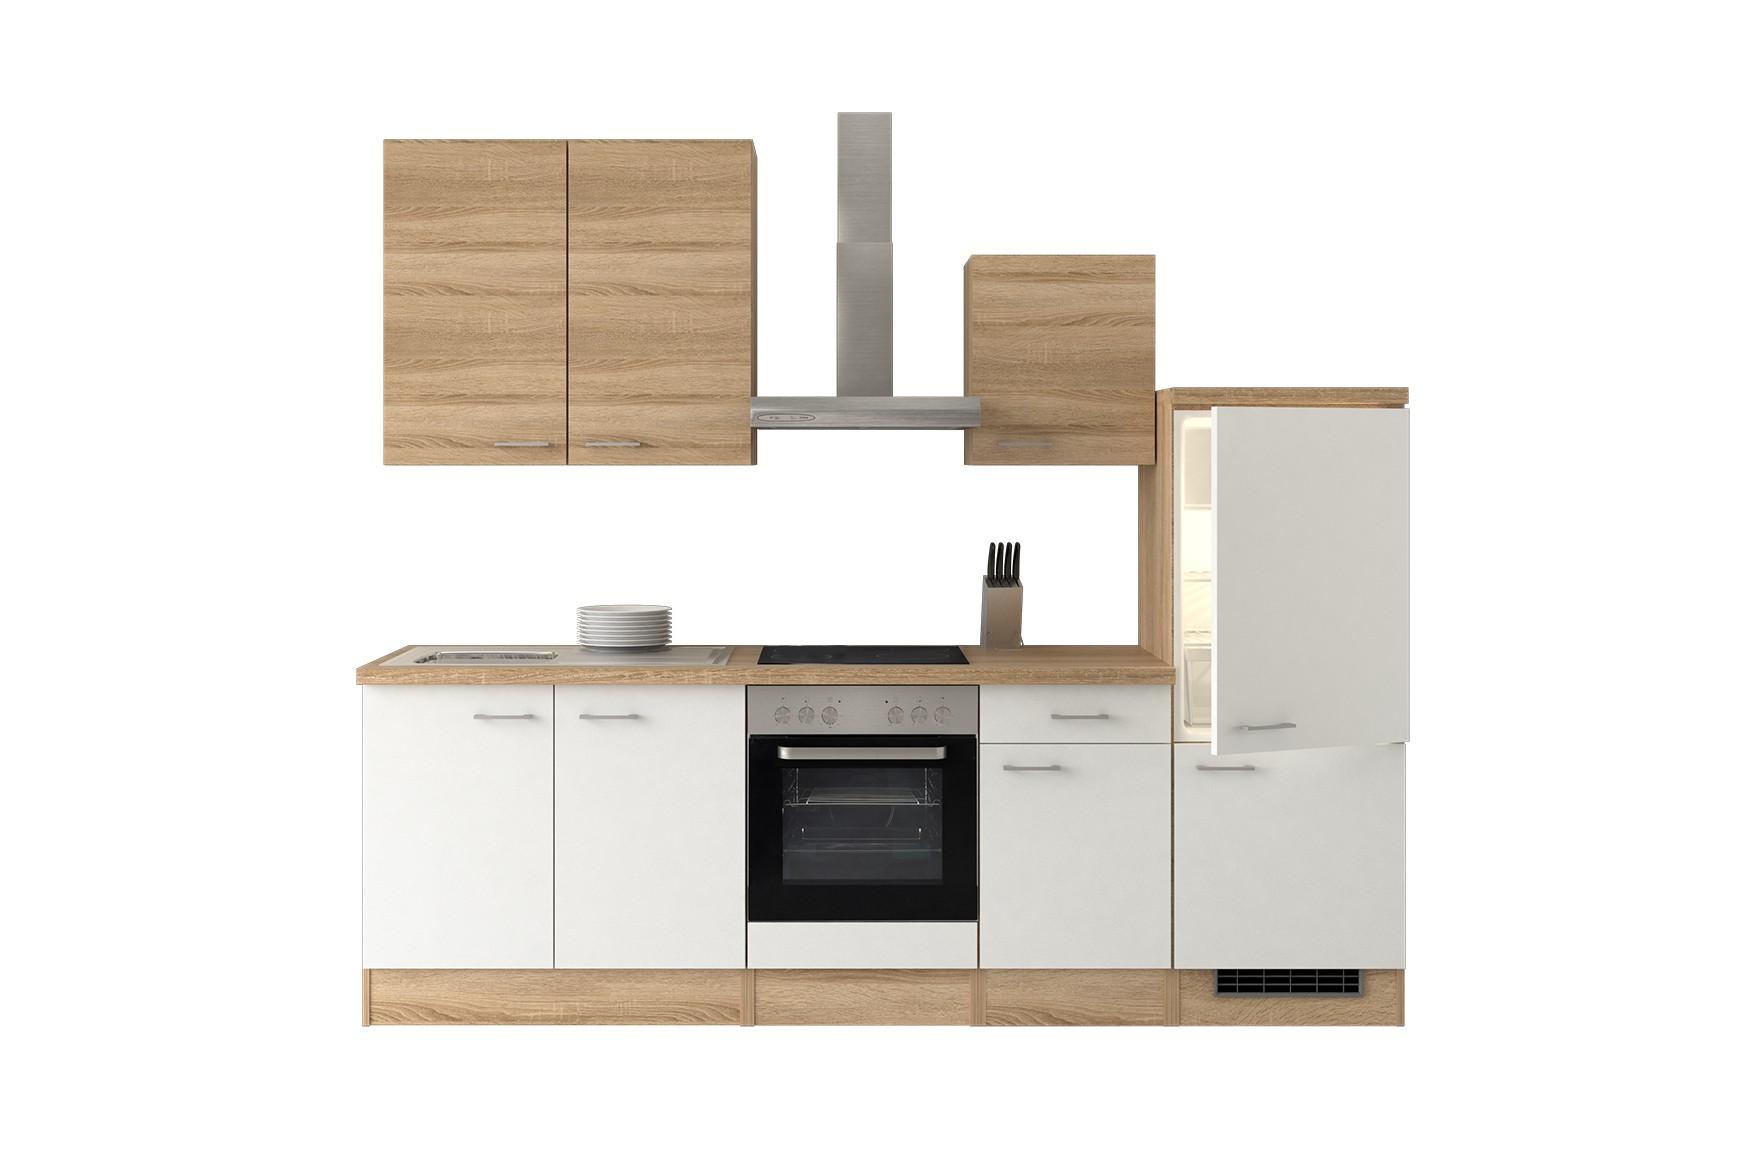 k che rom k chenzeile k chenblock mit elektroger ten 270 cm weiss ebay. Black Bedroom Furniture Sets. Home Design Ideas